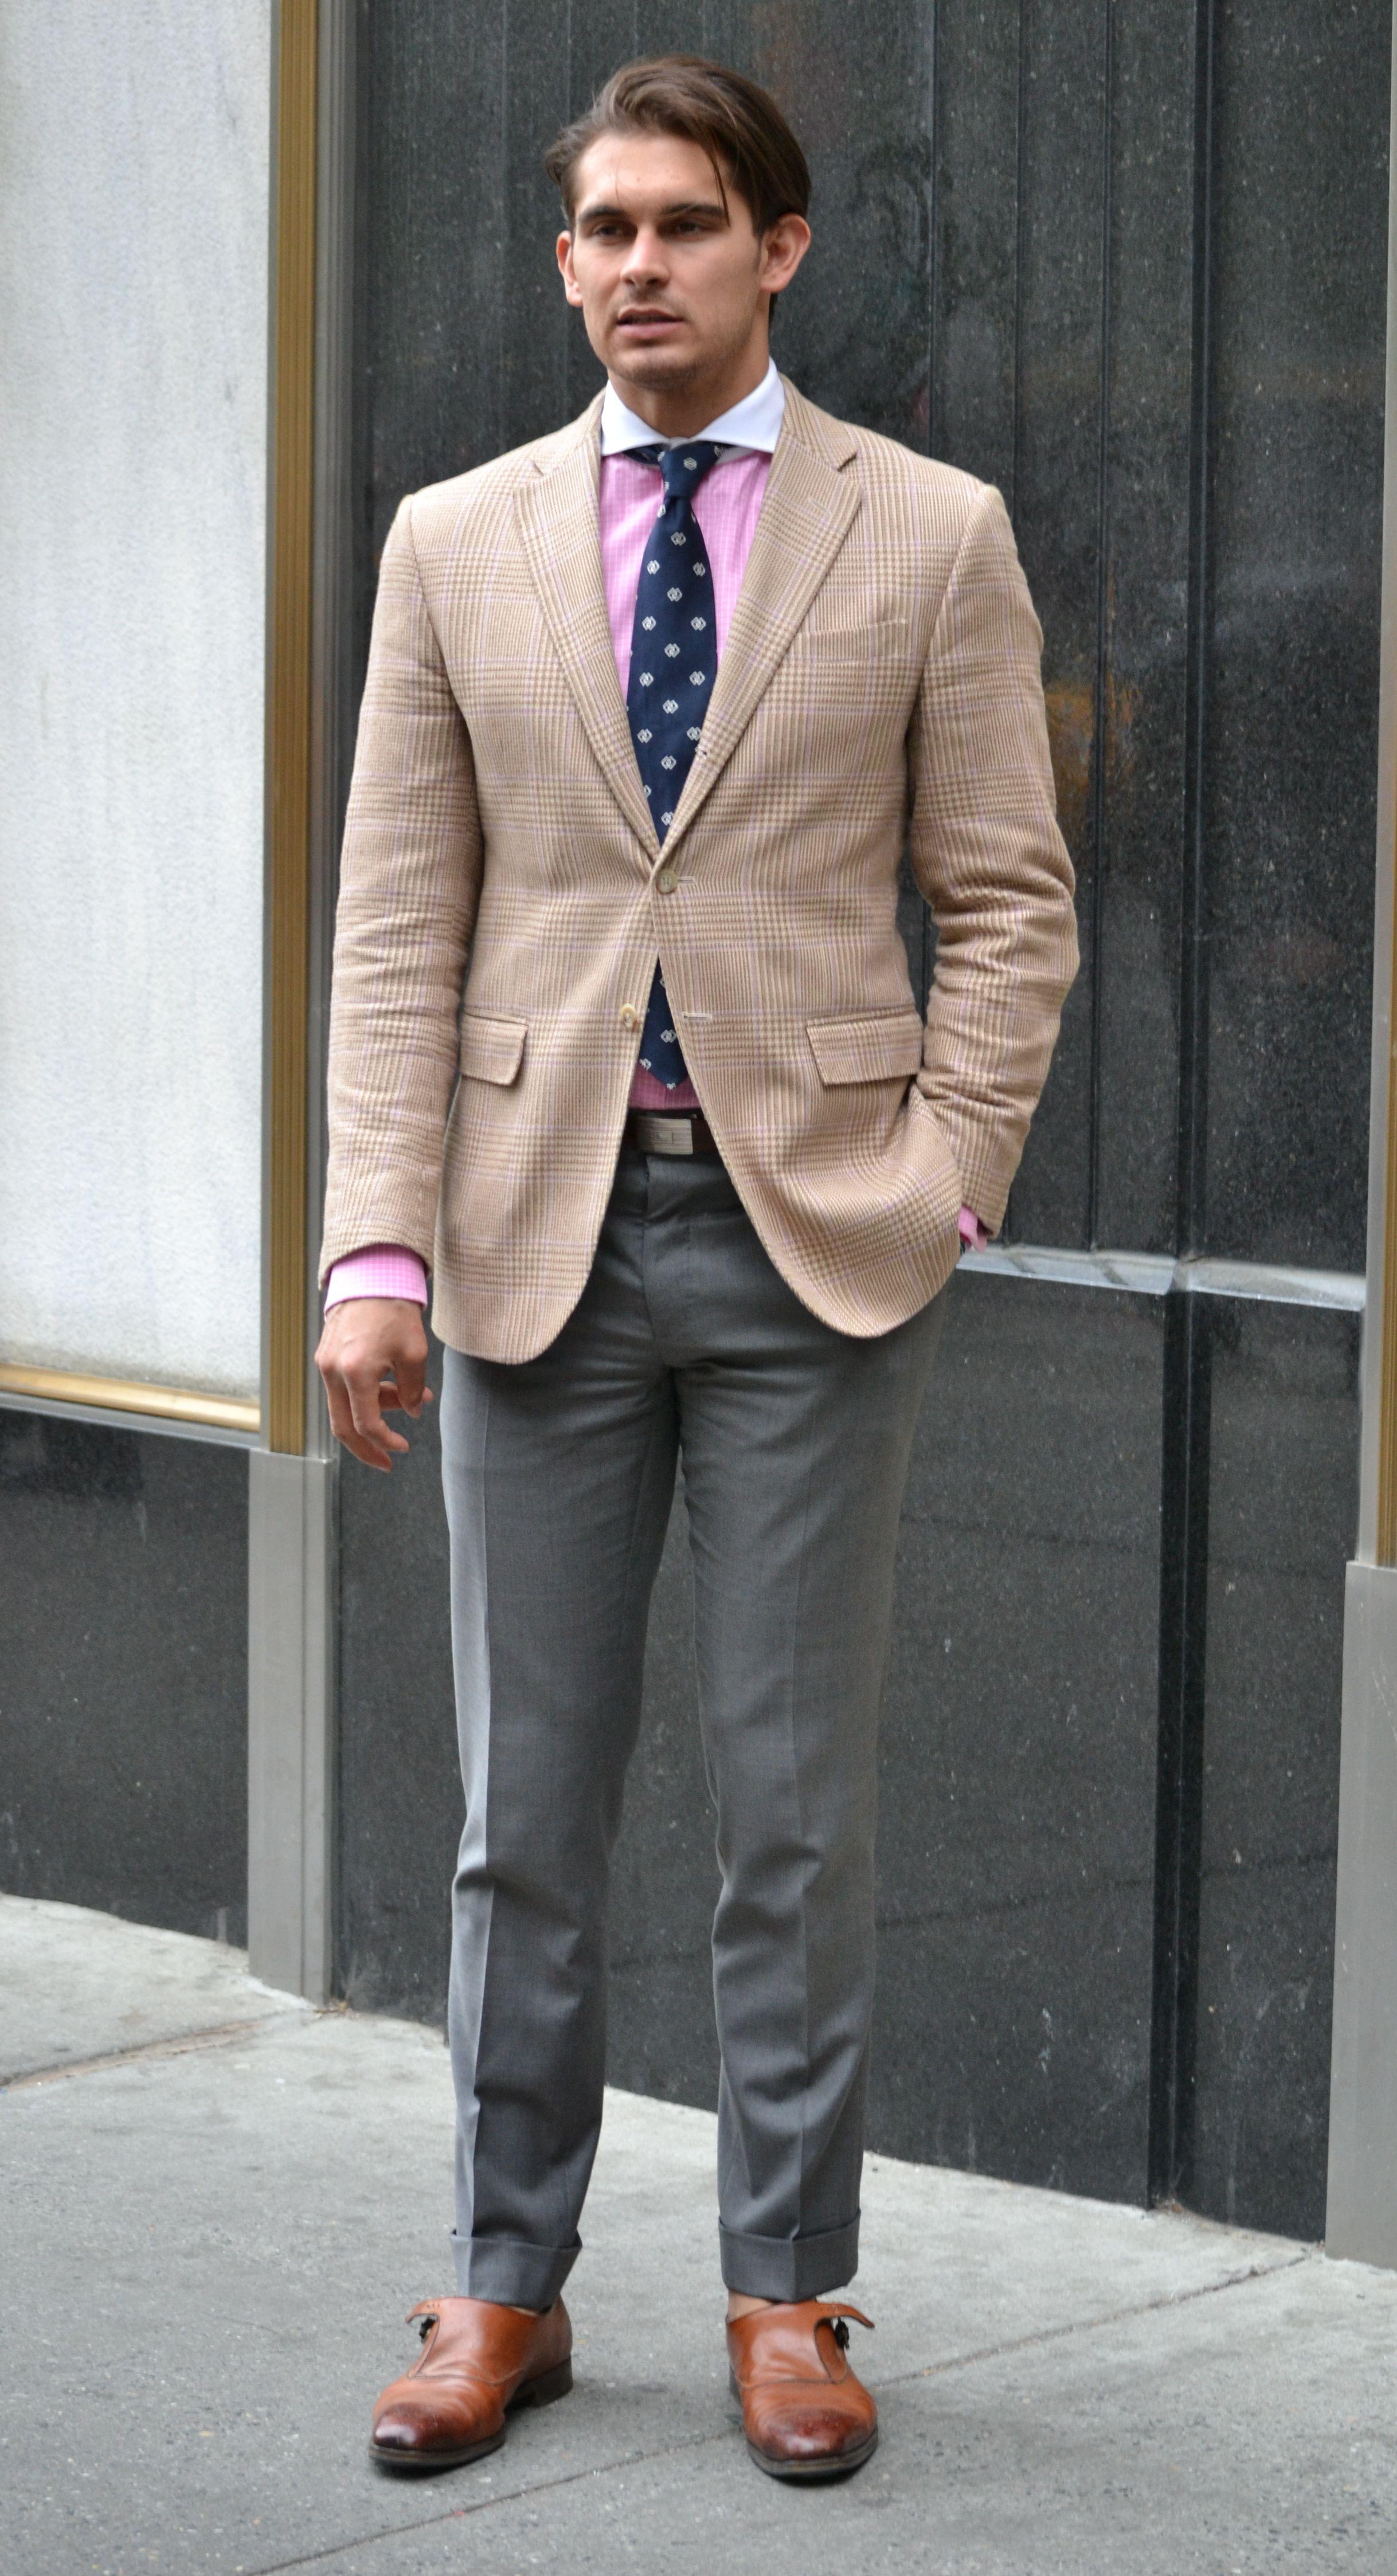 Coat Stores Near Me >> khaki jacket gray pants - Google Search | Michael Clothes | Mens fashion, Mens suits, Khaki jacket